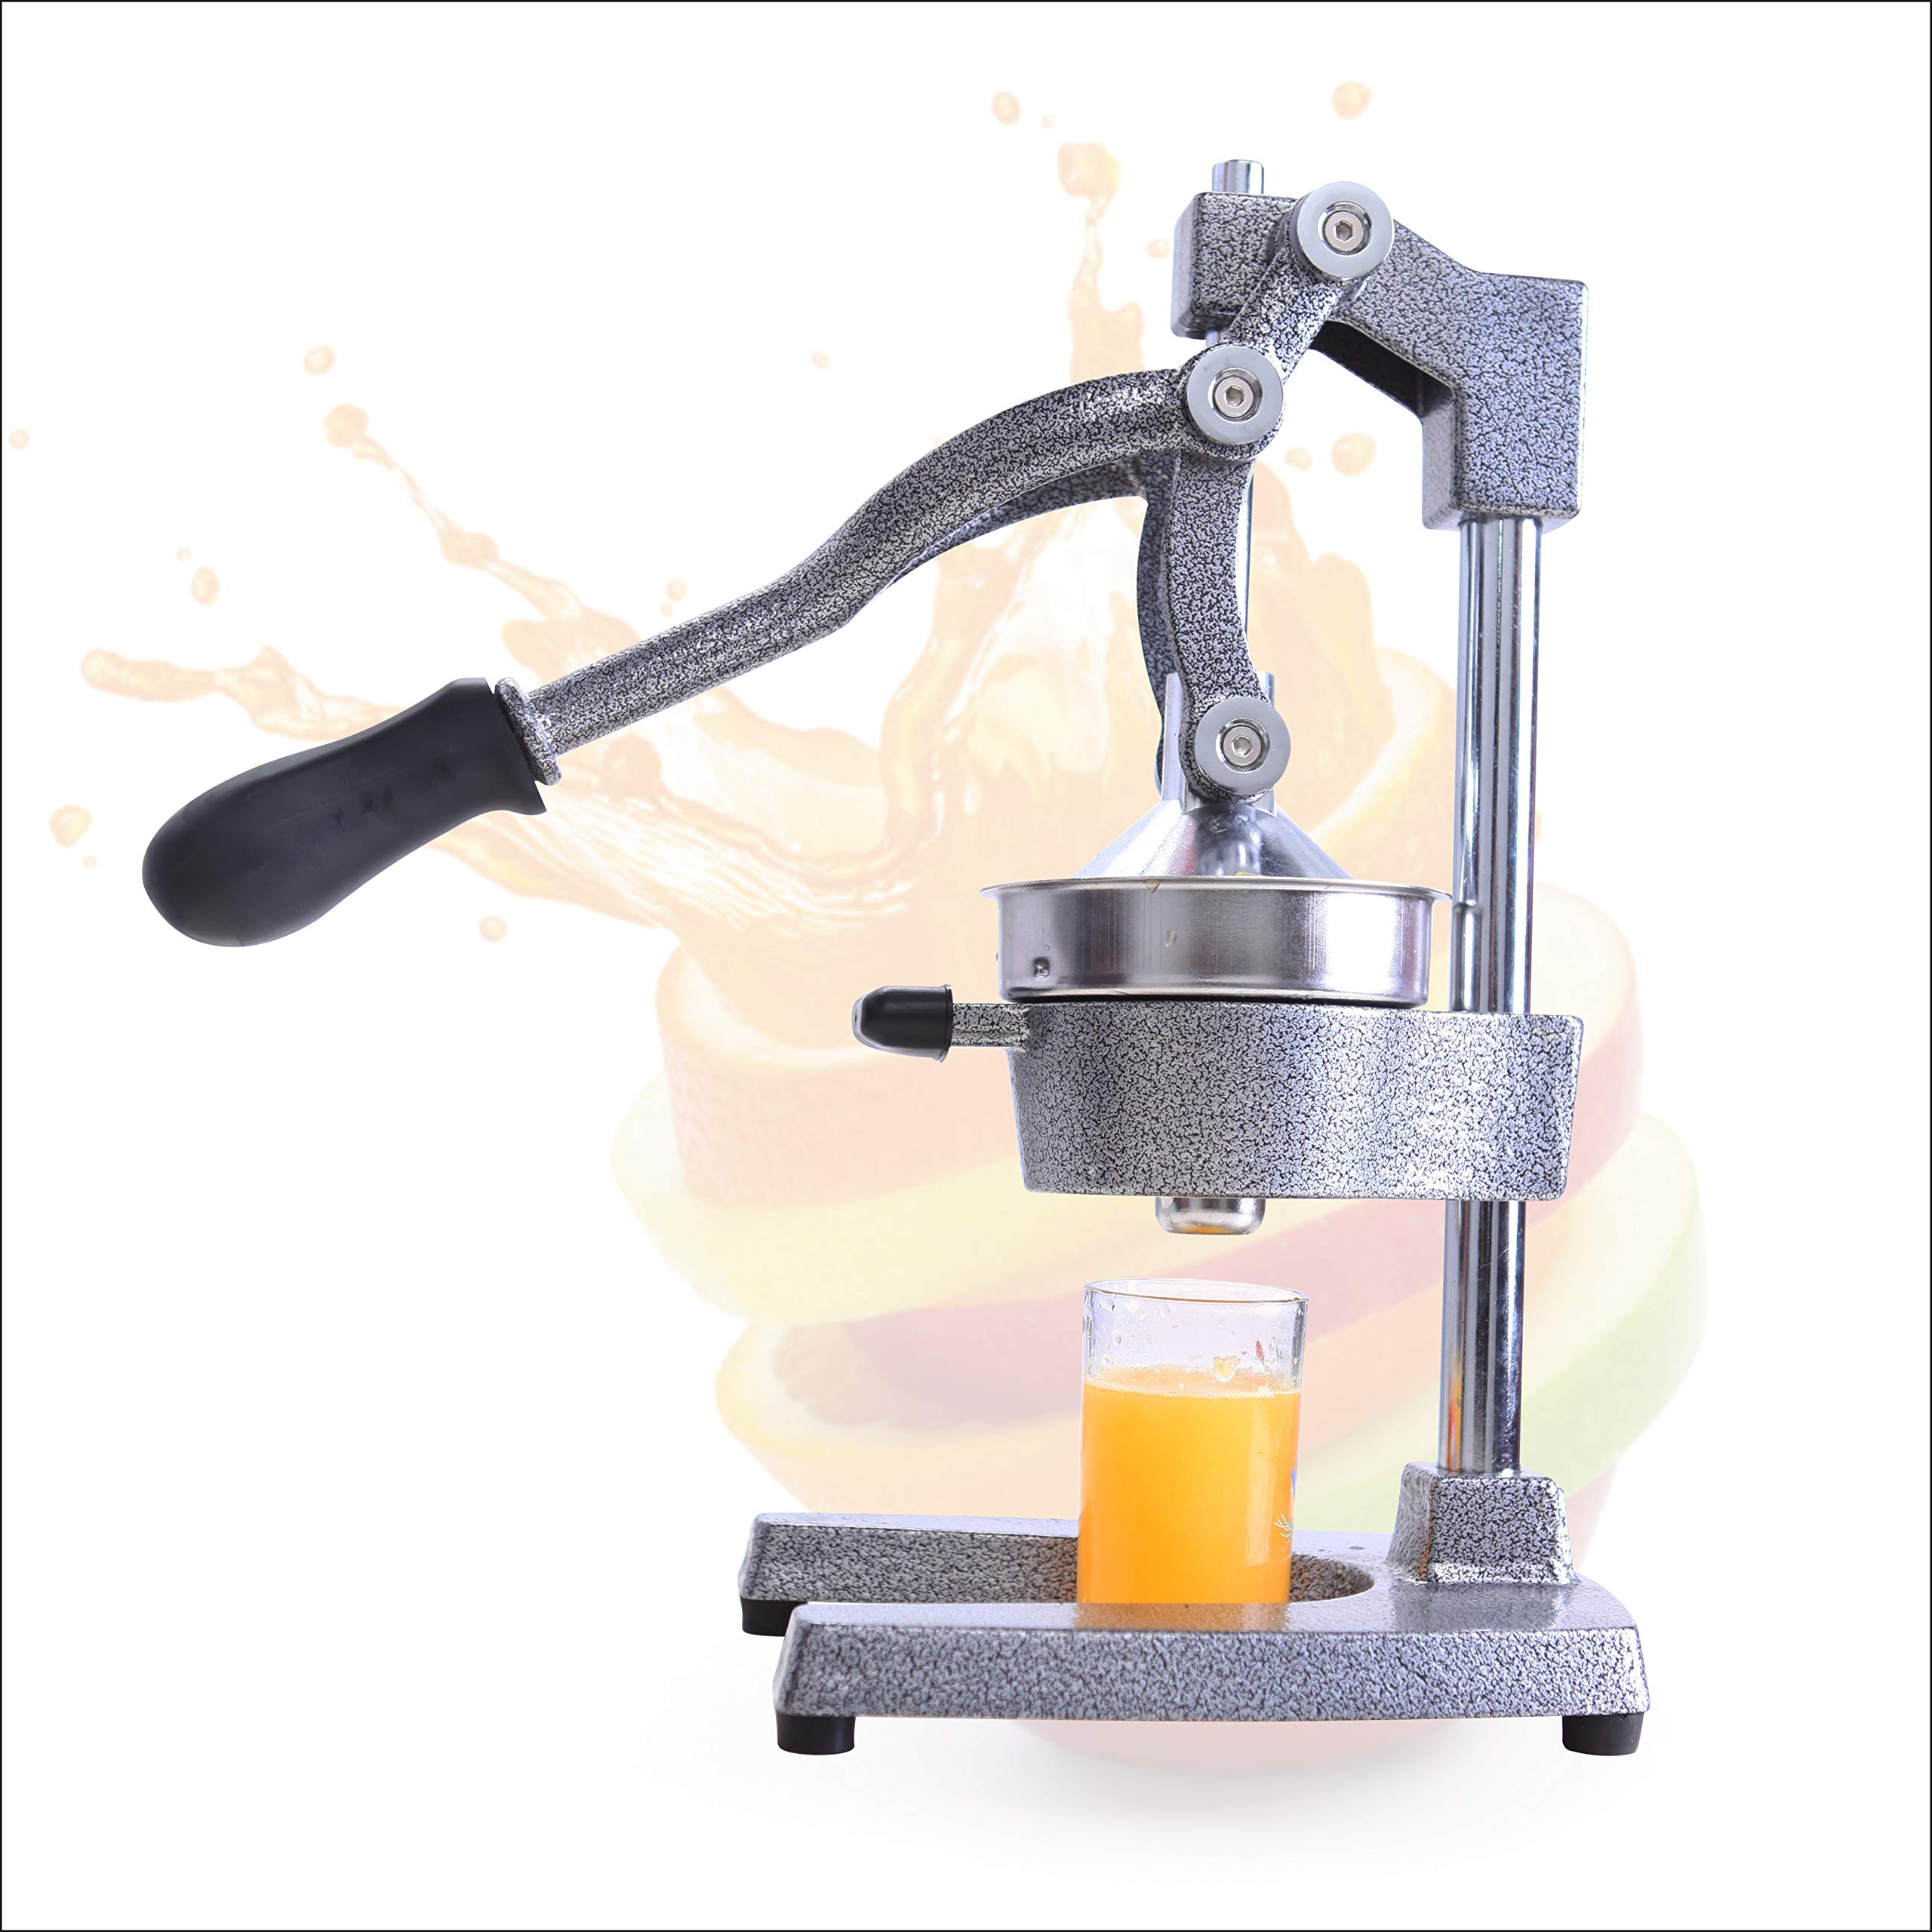 ARC USA, Juicer Press Squeezer, Manual Hand Press, Professional Fruit Juicer, Heavy Duty, Orange Juicer, Citrus Juicer, Lime Squeezer Press Stand, Commercial Grade Hand Press Extractor